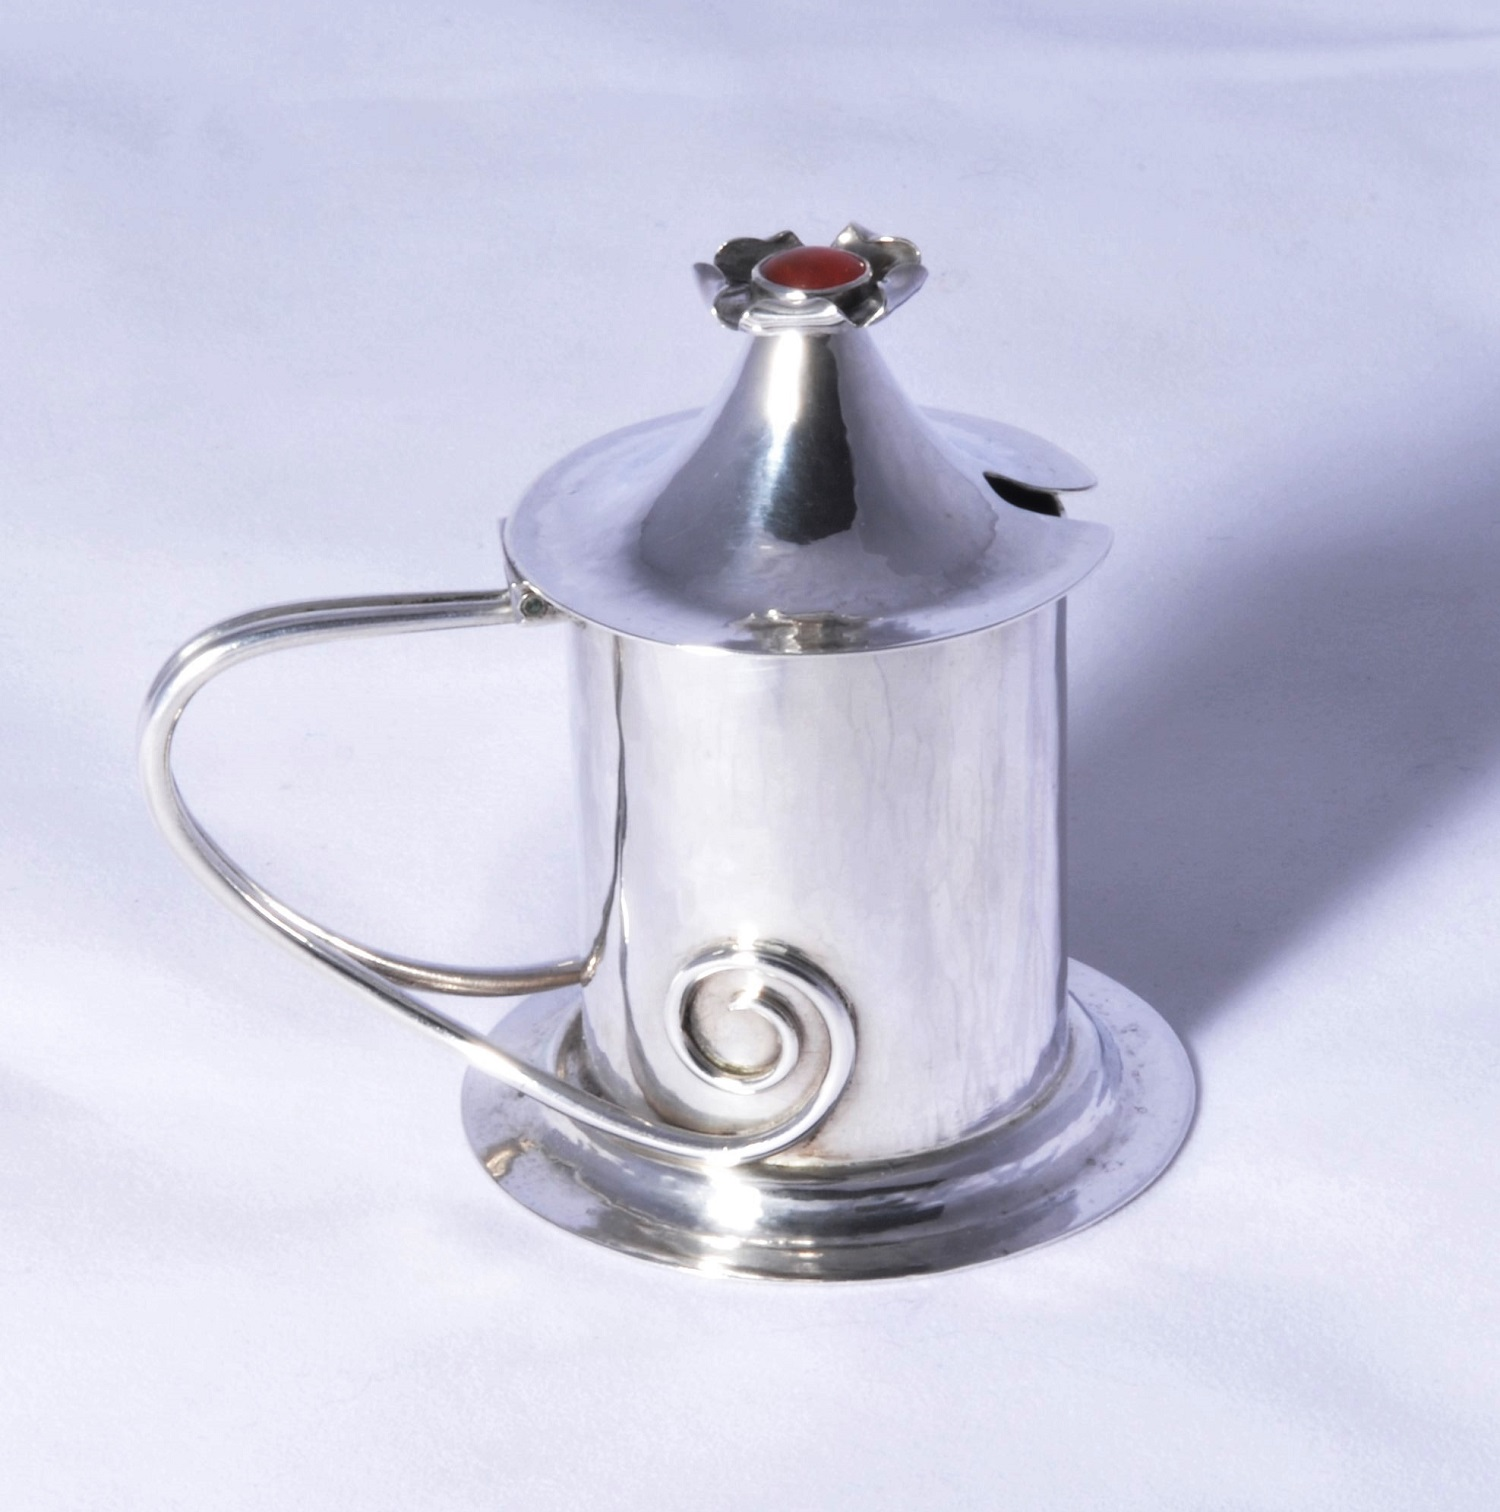 Charles Ashbee Guild of Handicraft silver mustard